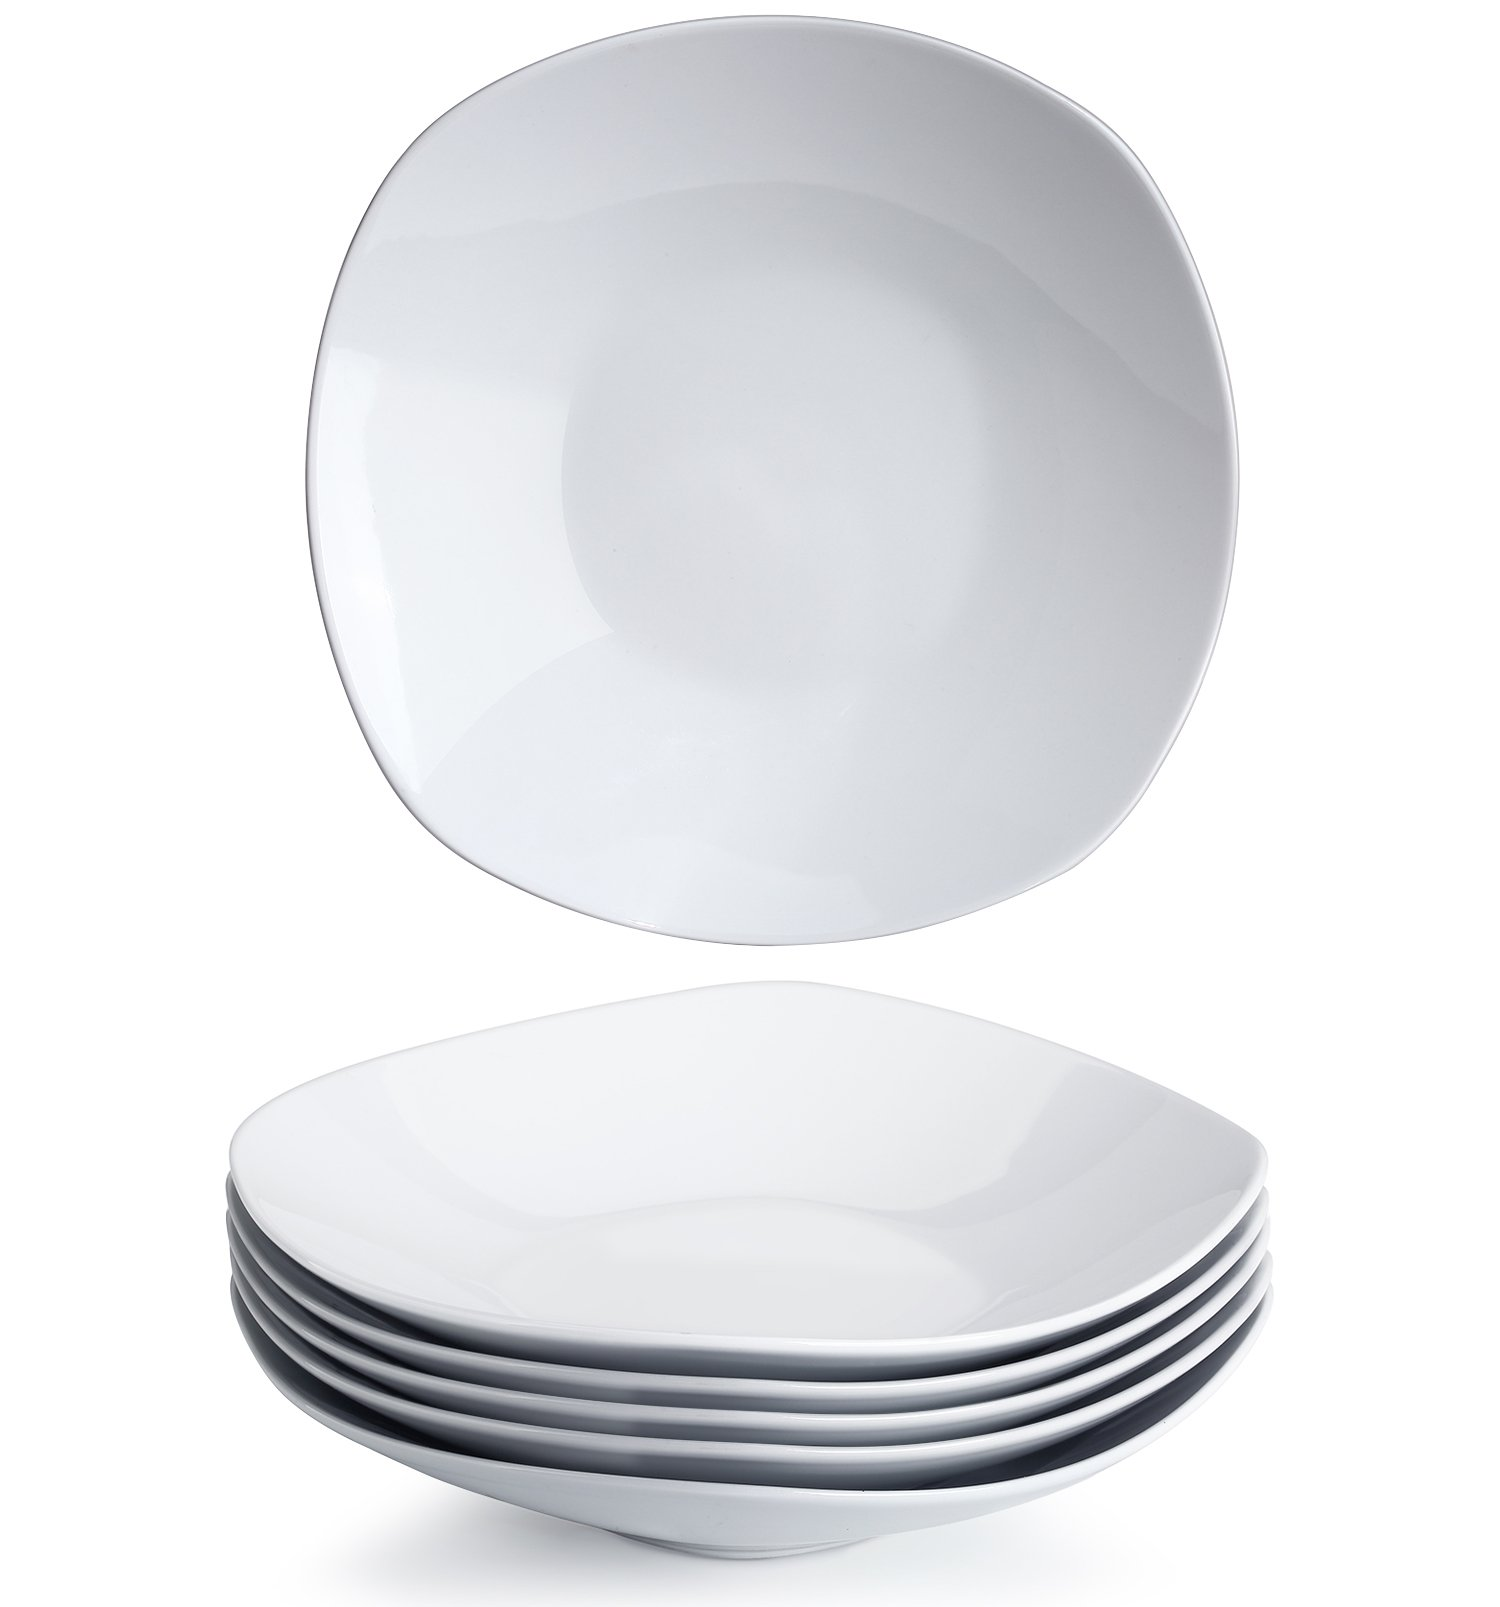 YHY 9-inch Porcelain Salad/Pasta/Dessert Bowls,White Square Bowl Set, Wide & Shallow, Set of 6